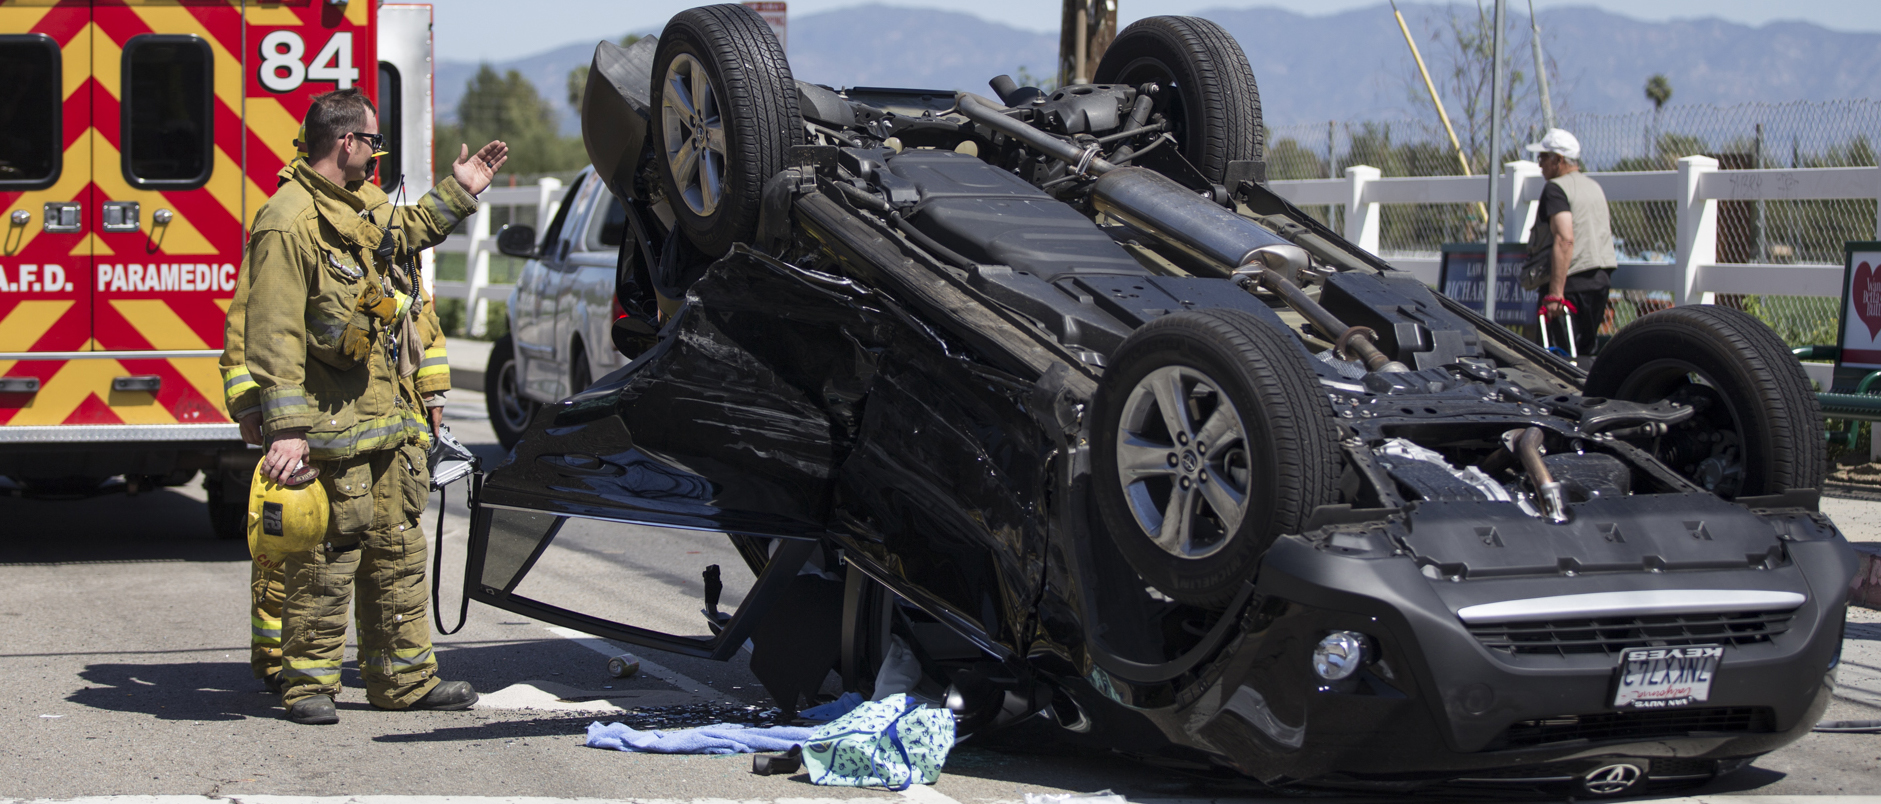 Car overturns in collision on De Soto Avenue